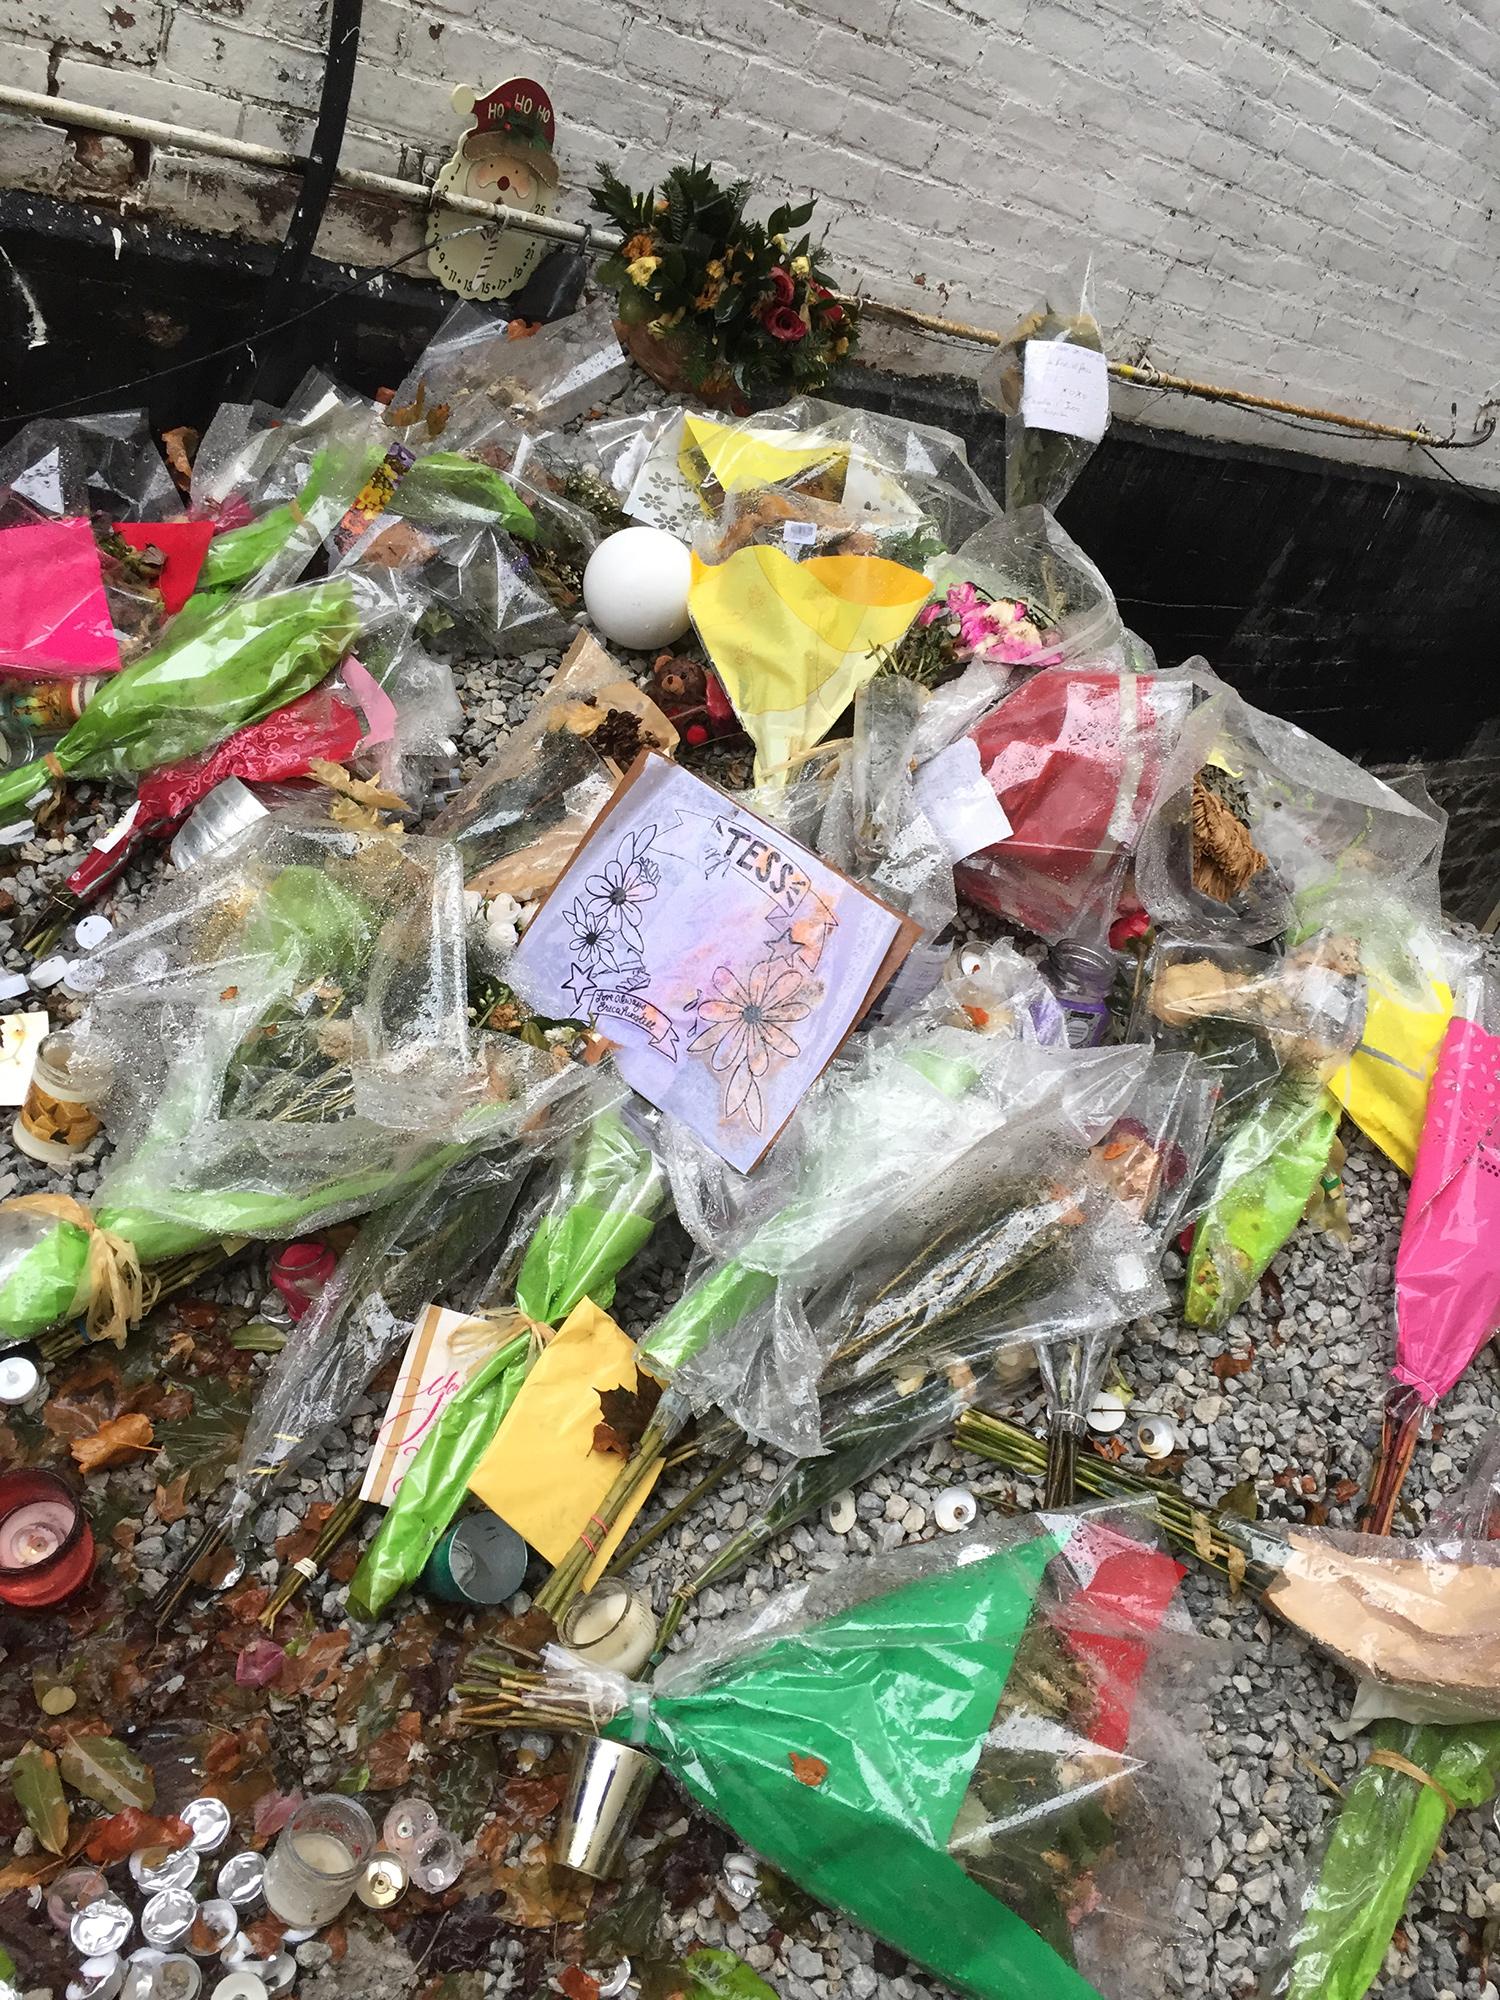 Tess Richey's memorial. (Photo credit: Anthony Oliveira)